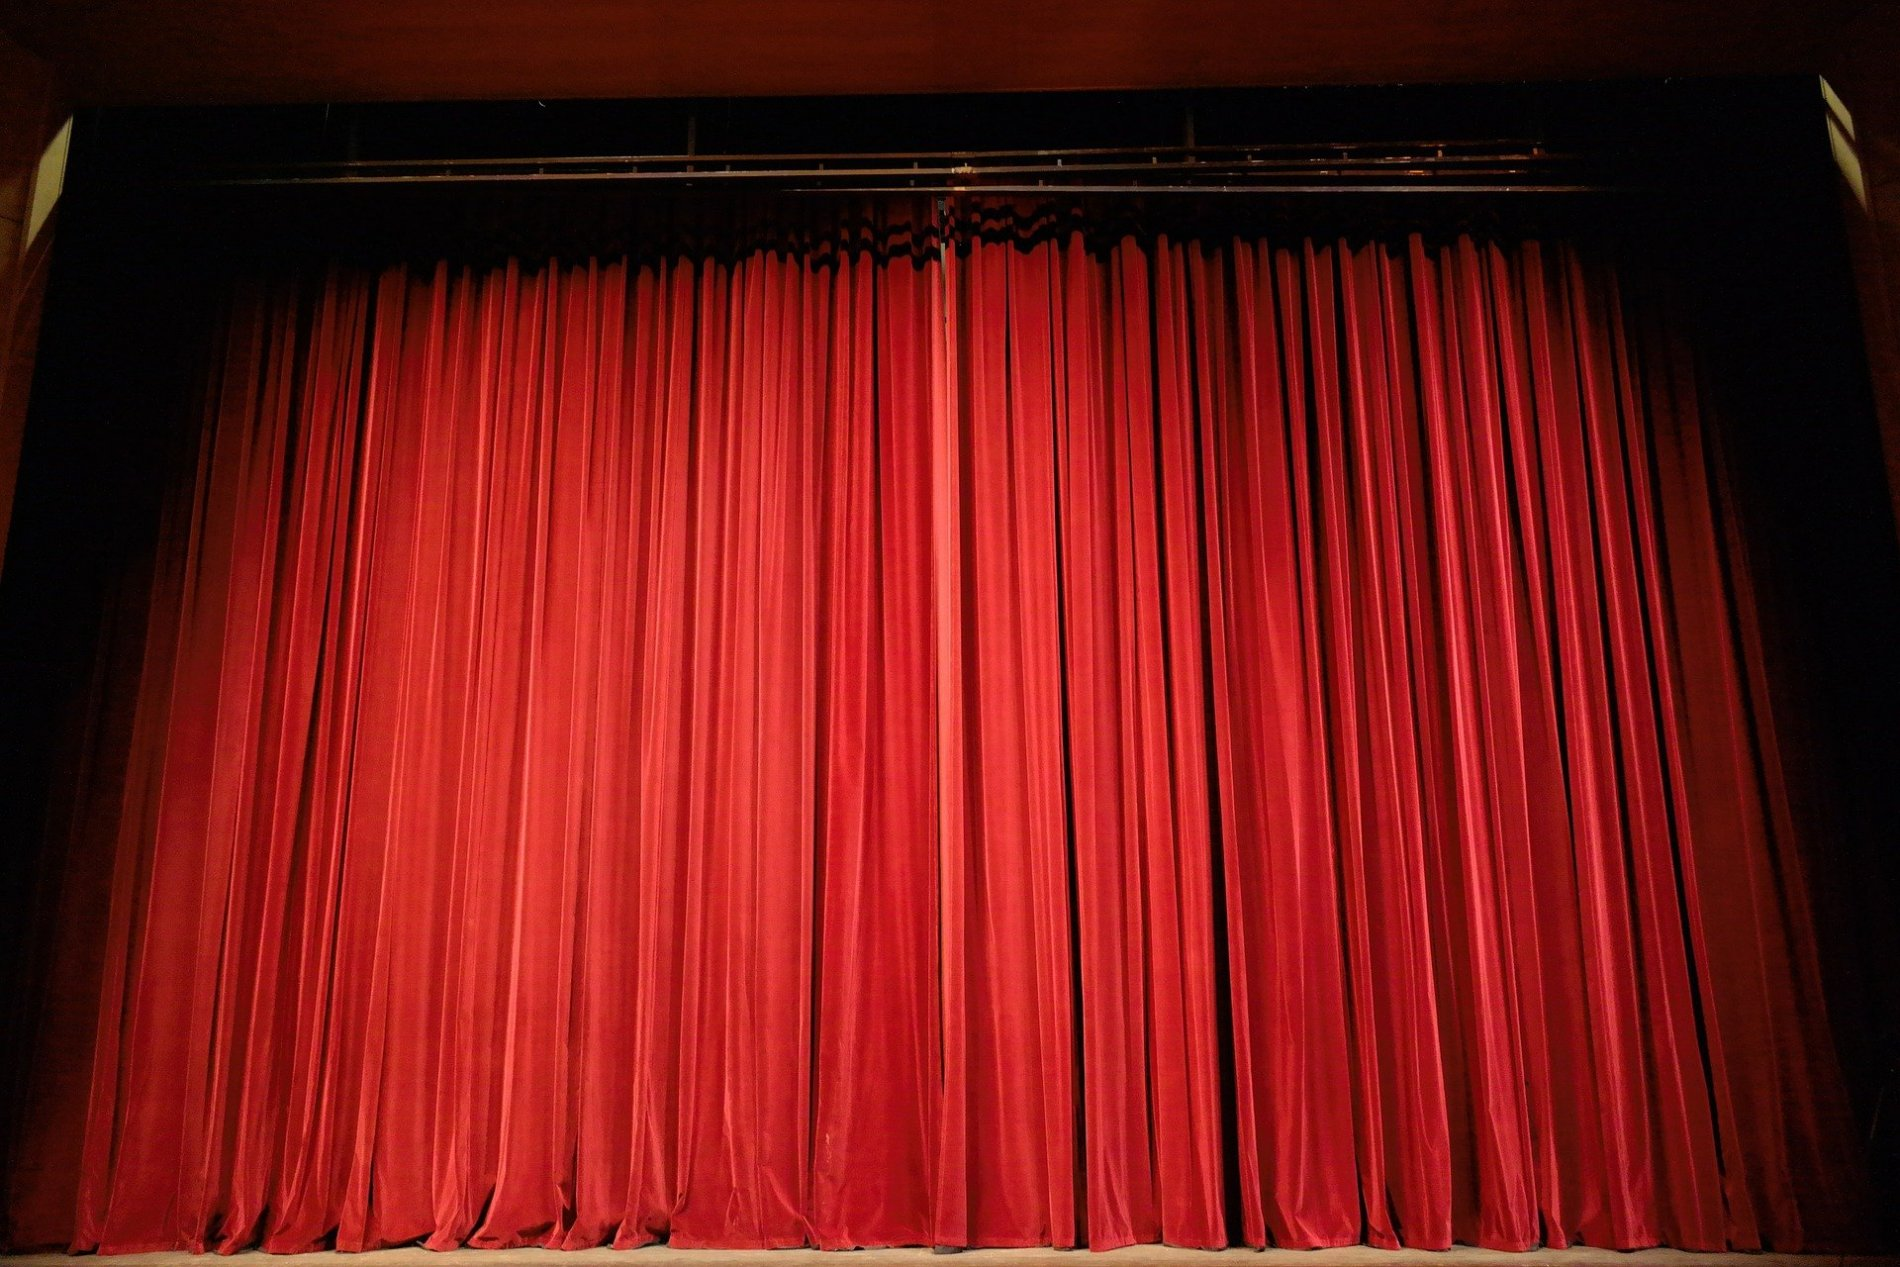 Theater, Bühne, Kino